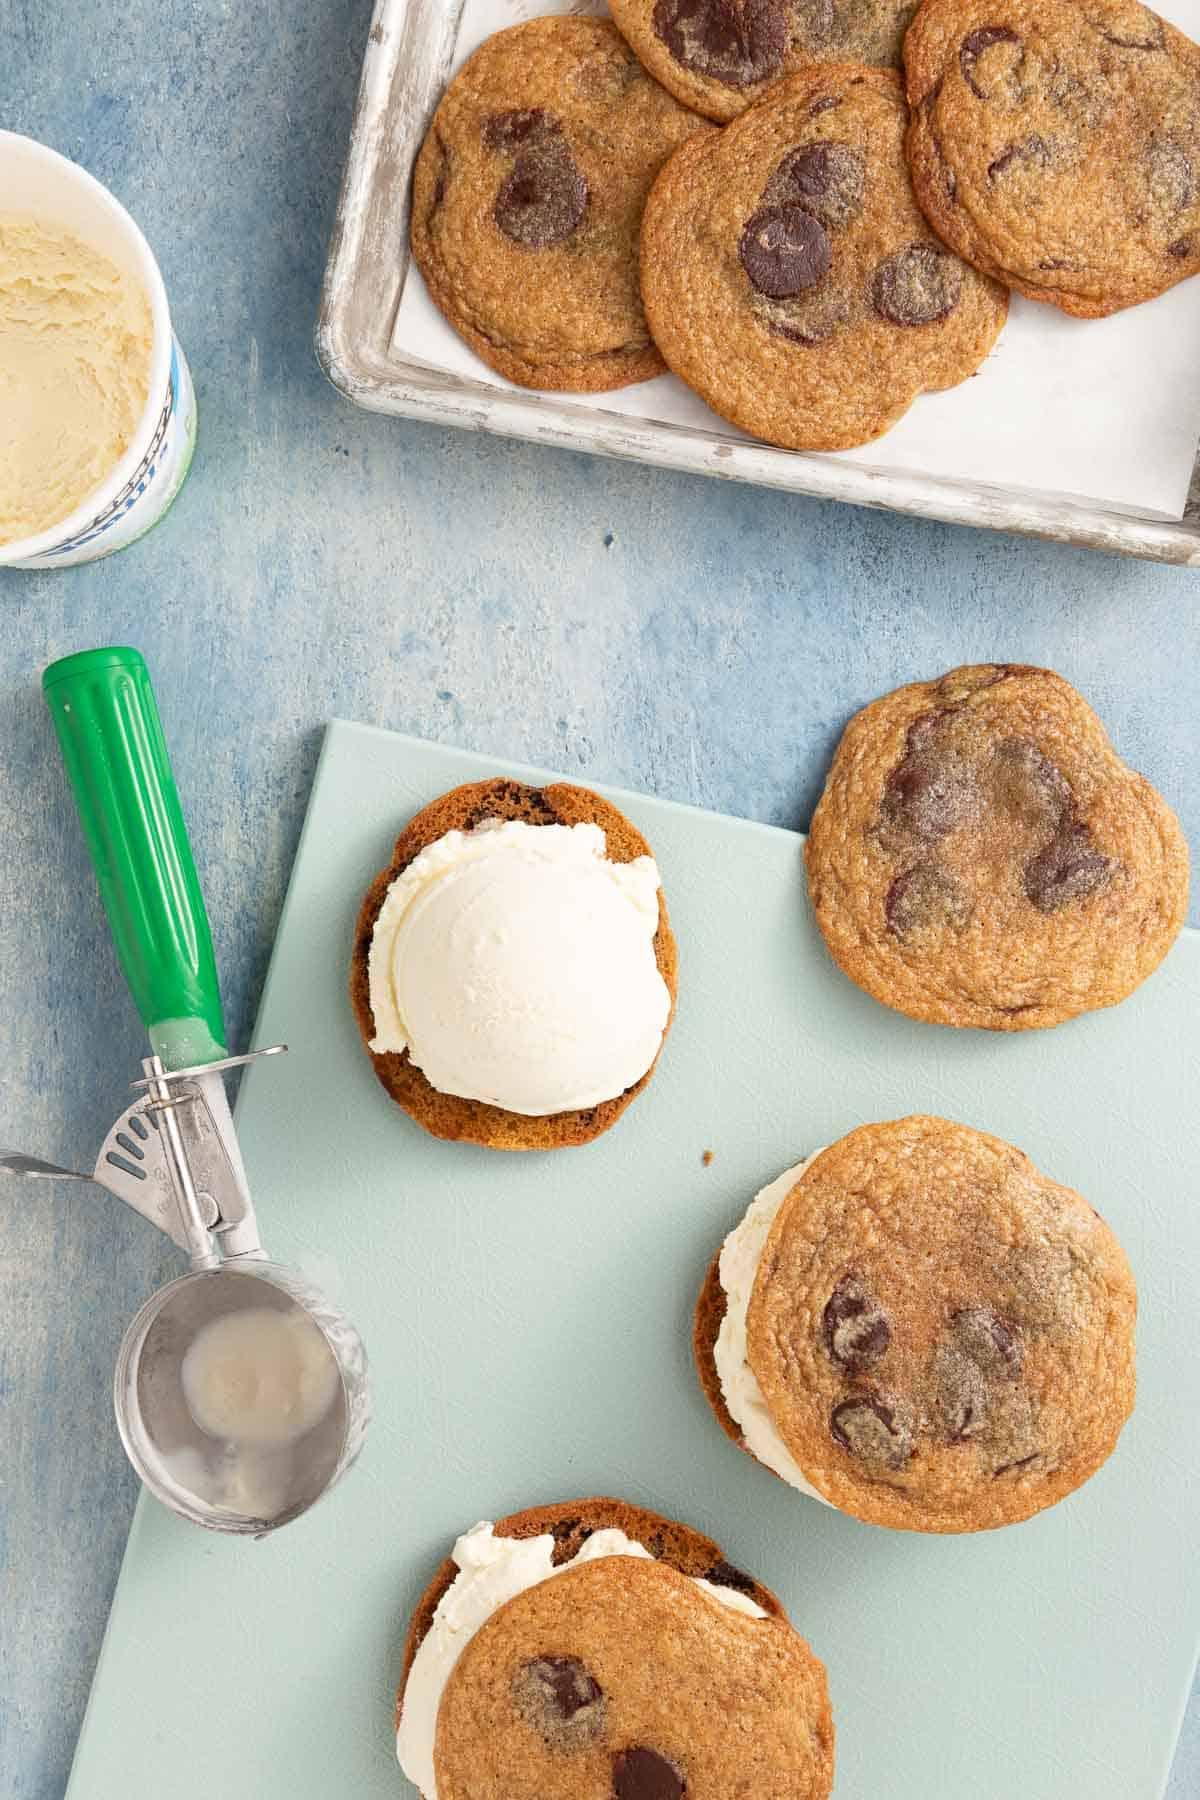 scooping vanilla ice cream onto chocolate chip cookies